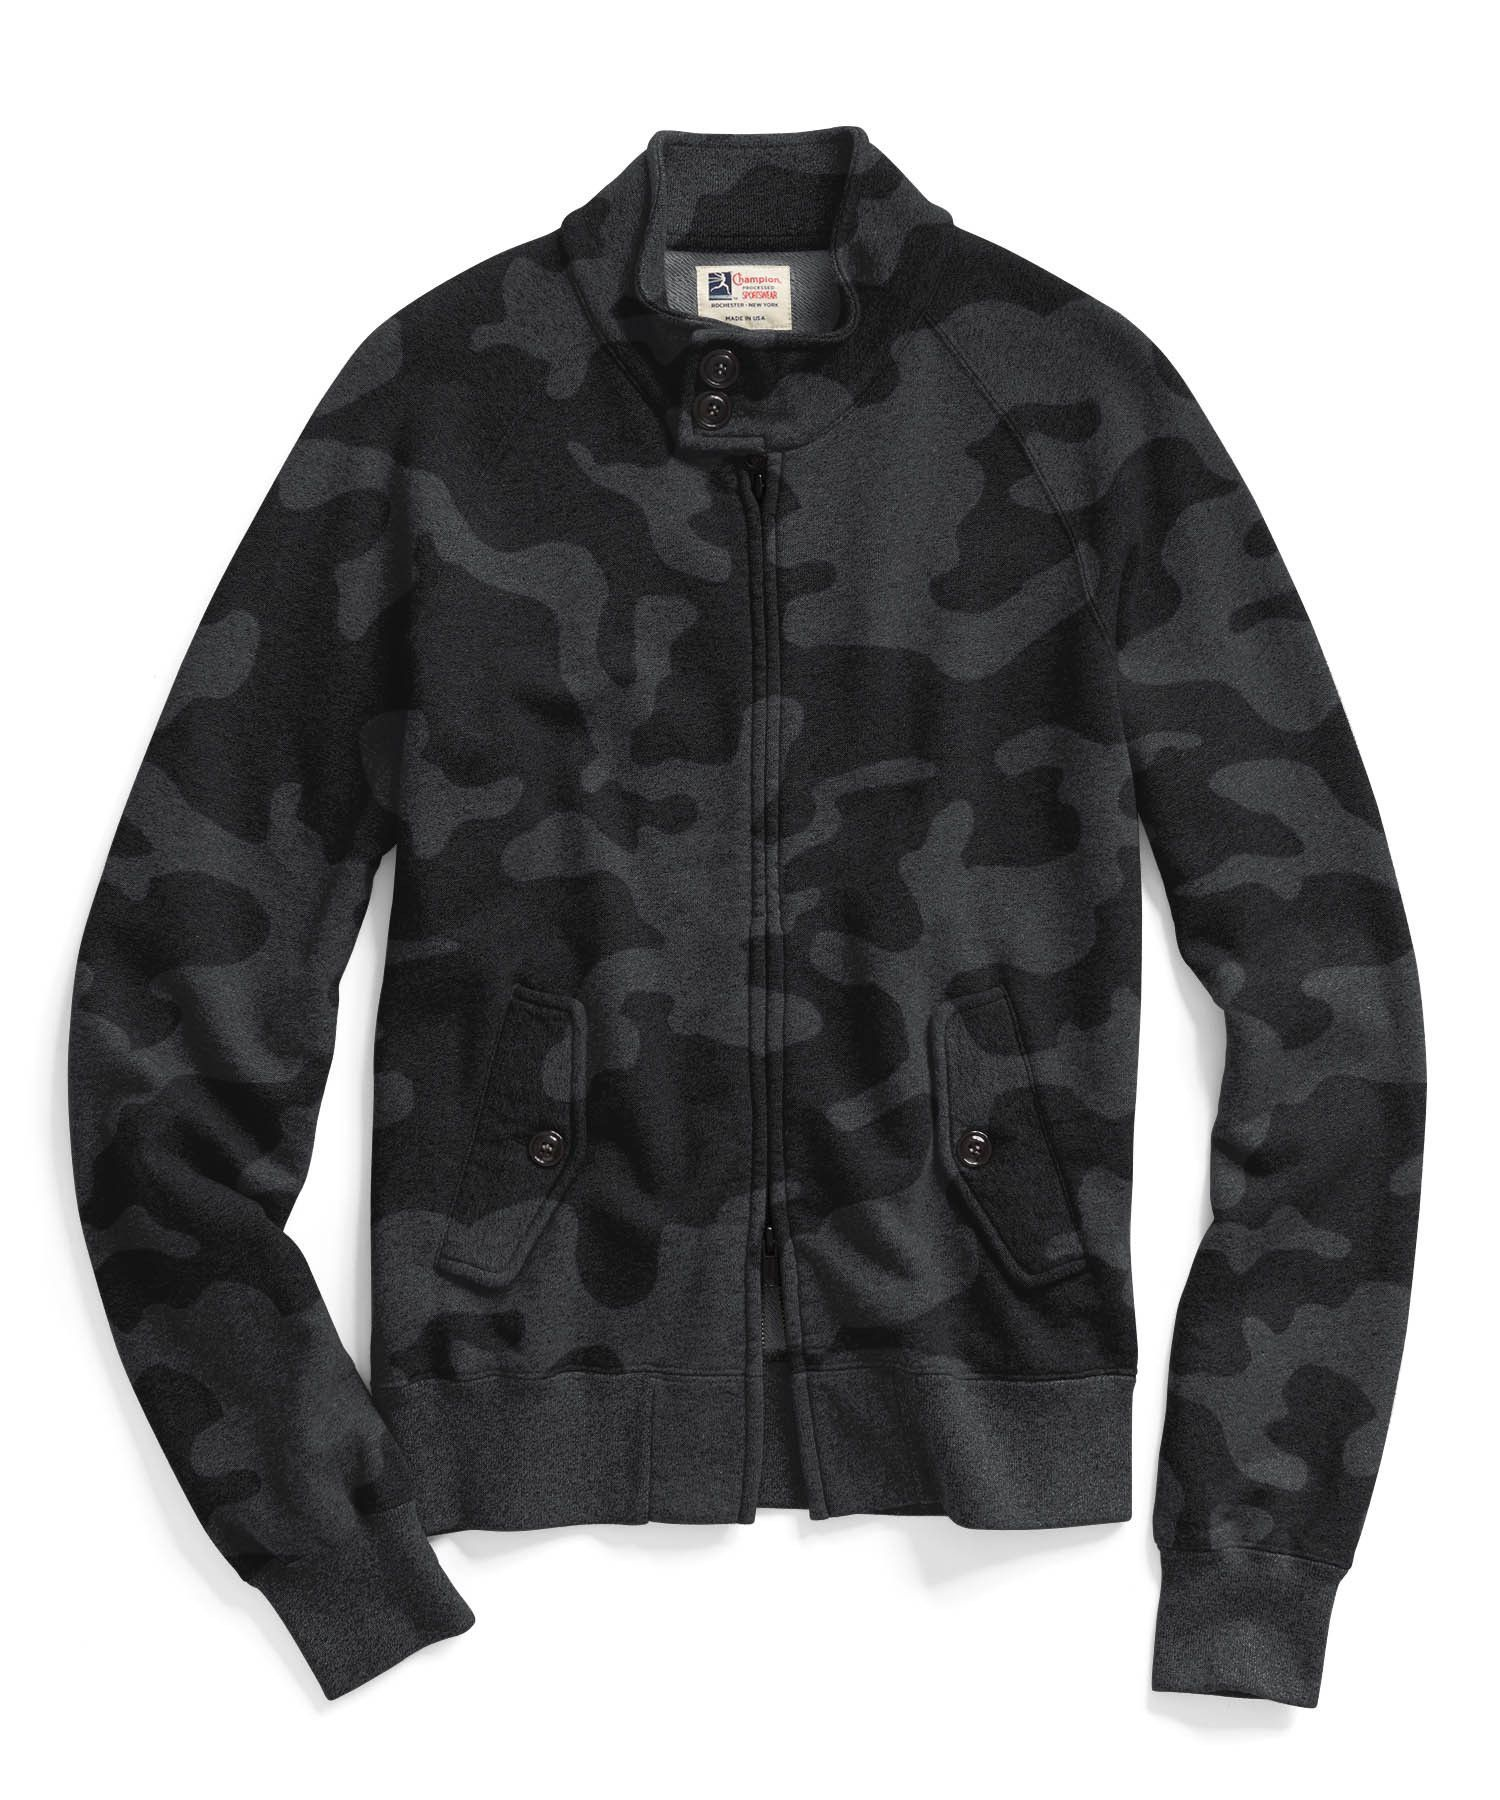 Golf Jacket in Black Camo